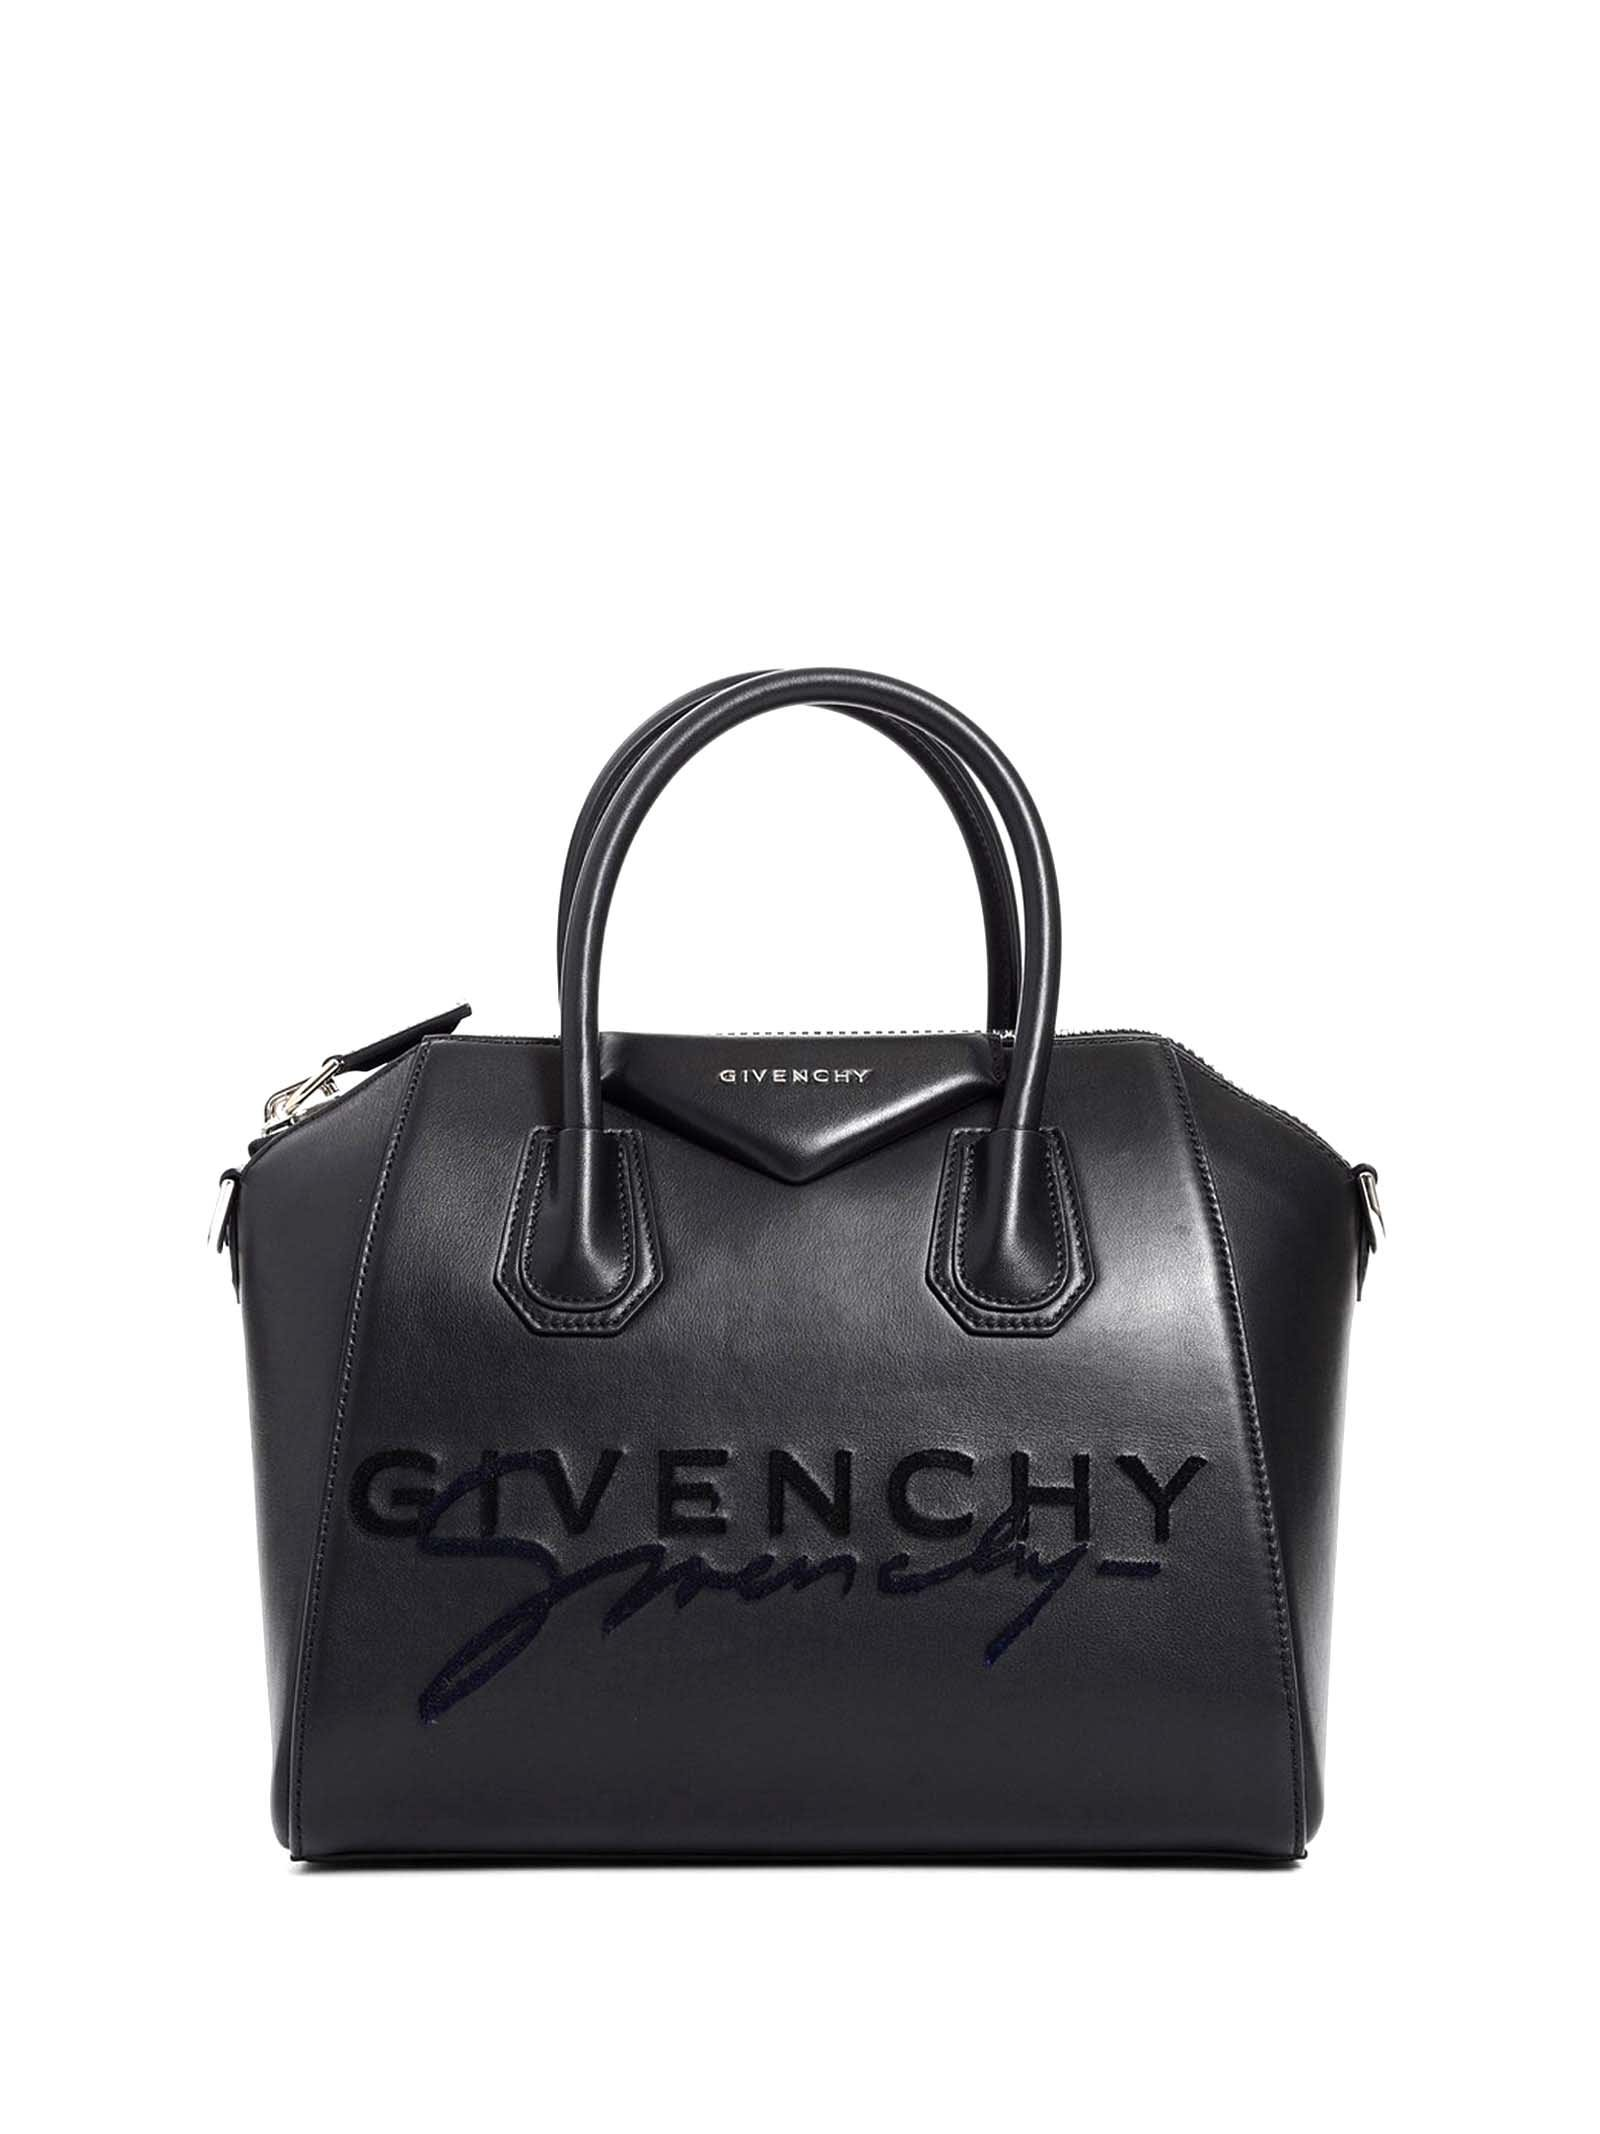 Givenchy Givenchy Antigona Tote Bag